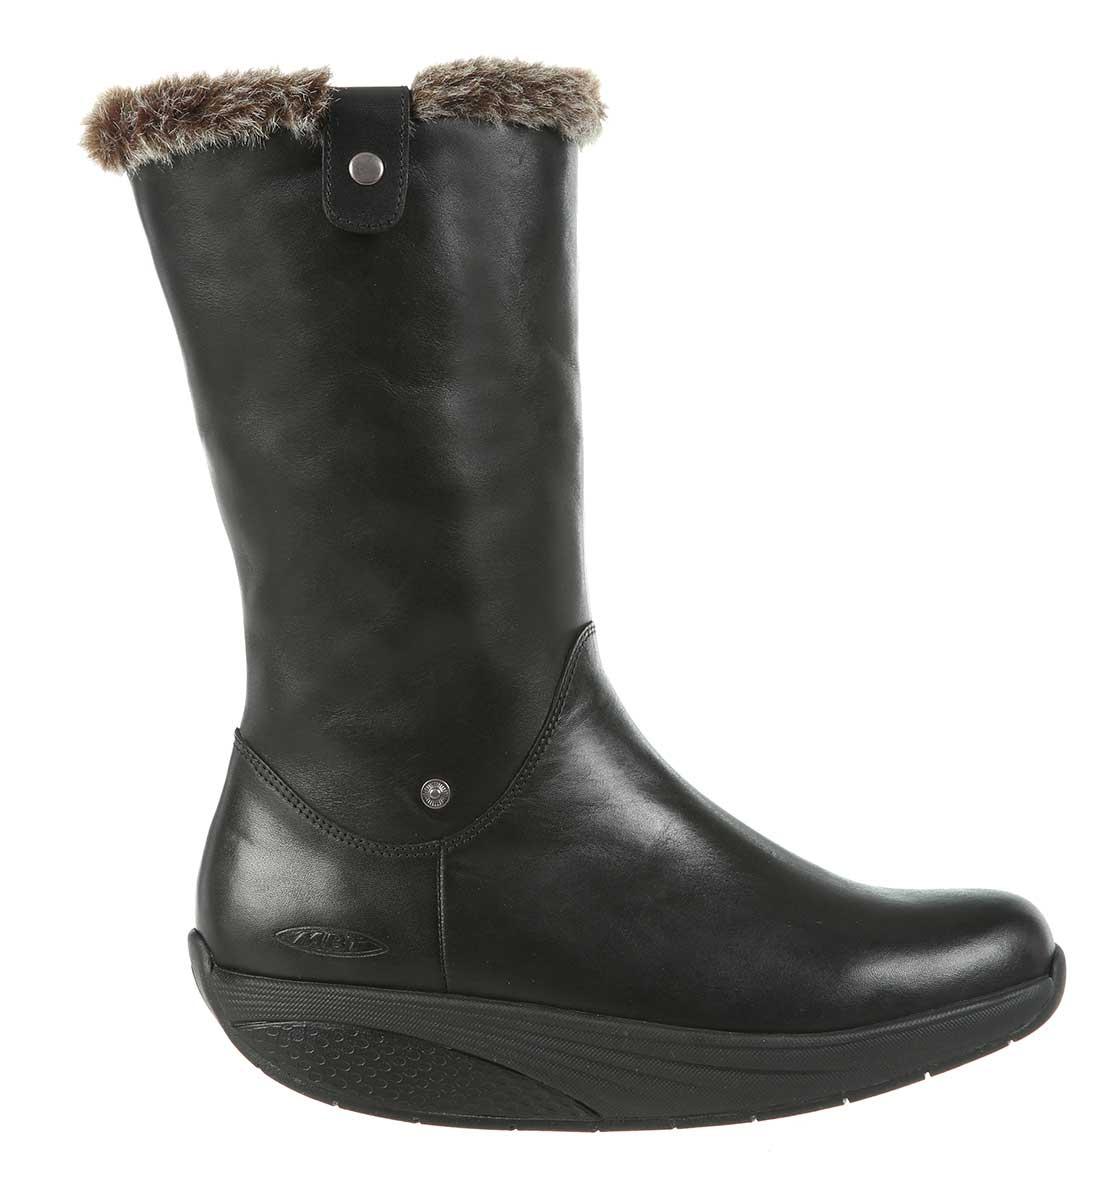 MBT Shoes Women s Belle Mid Cut Boots - 700984 - Moderate a8effdcf8